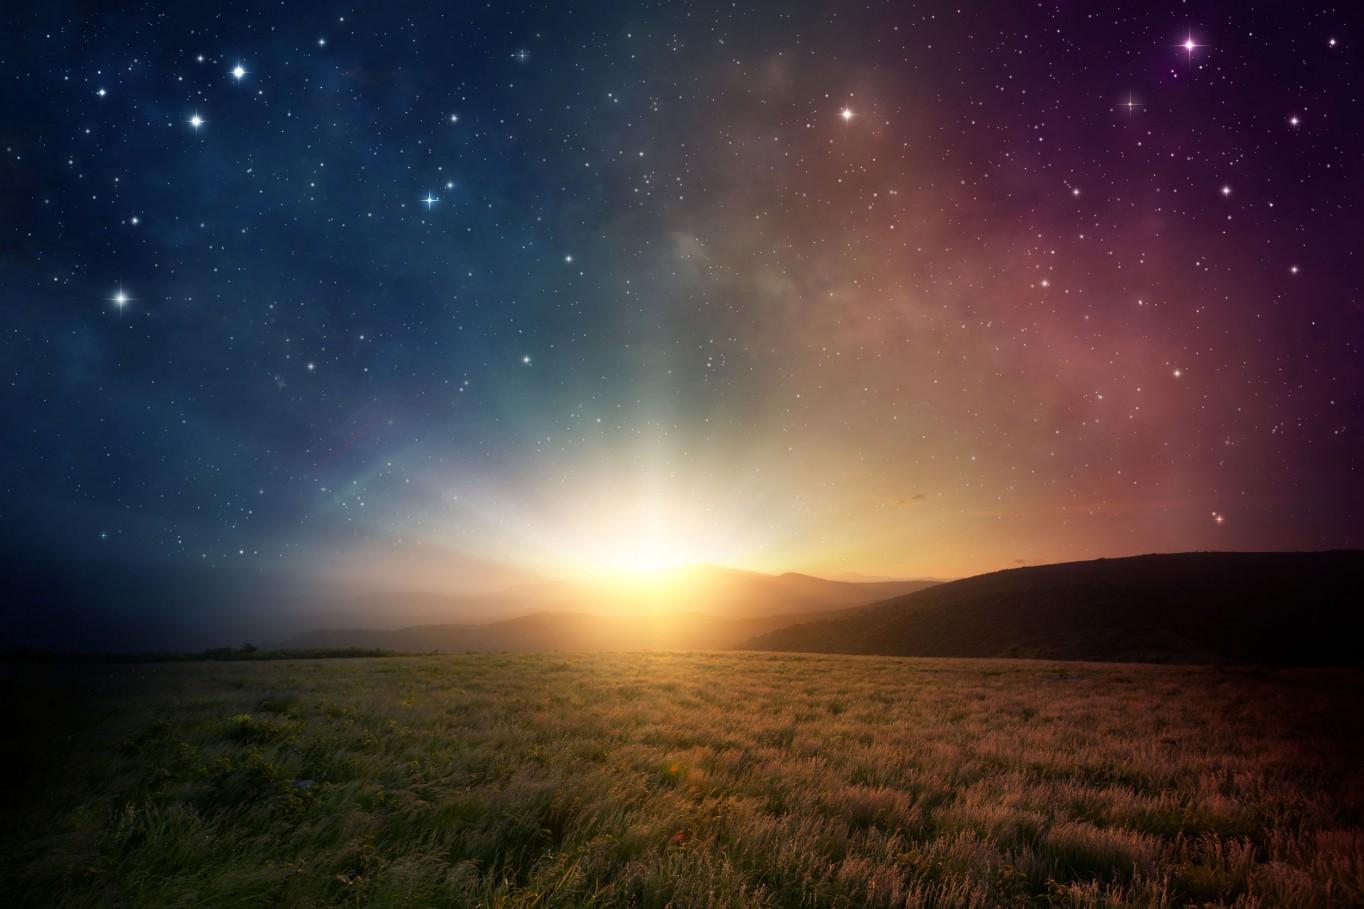 Beautiful sunrise with stars and galaxy in night sky.